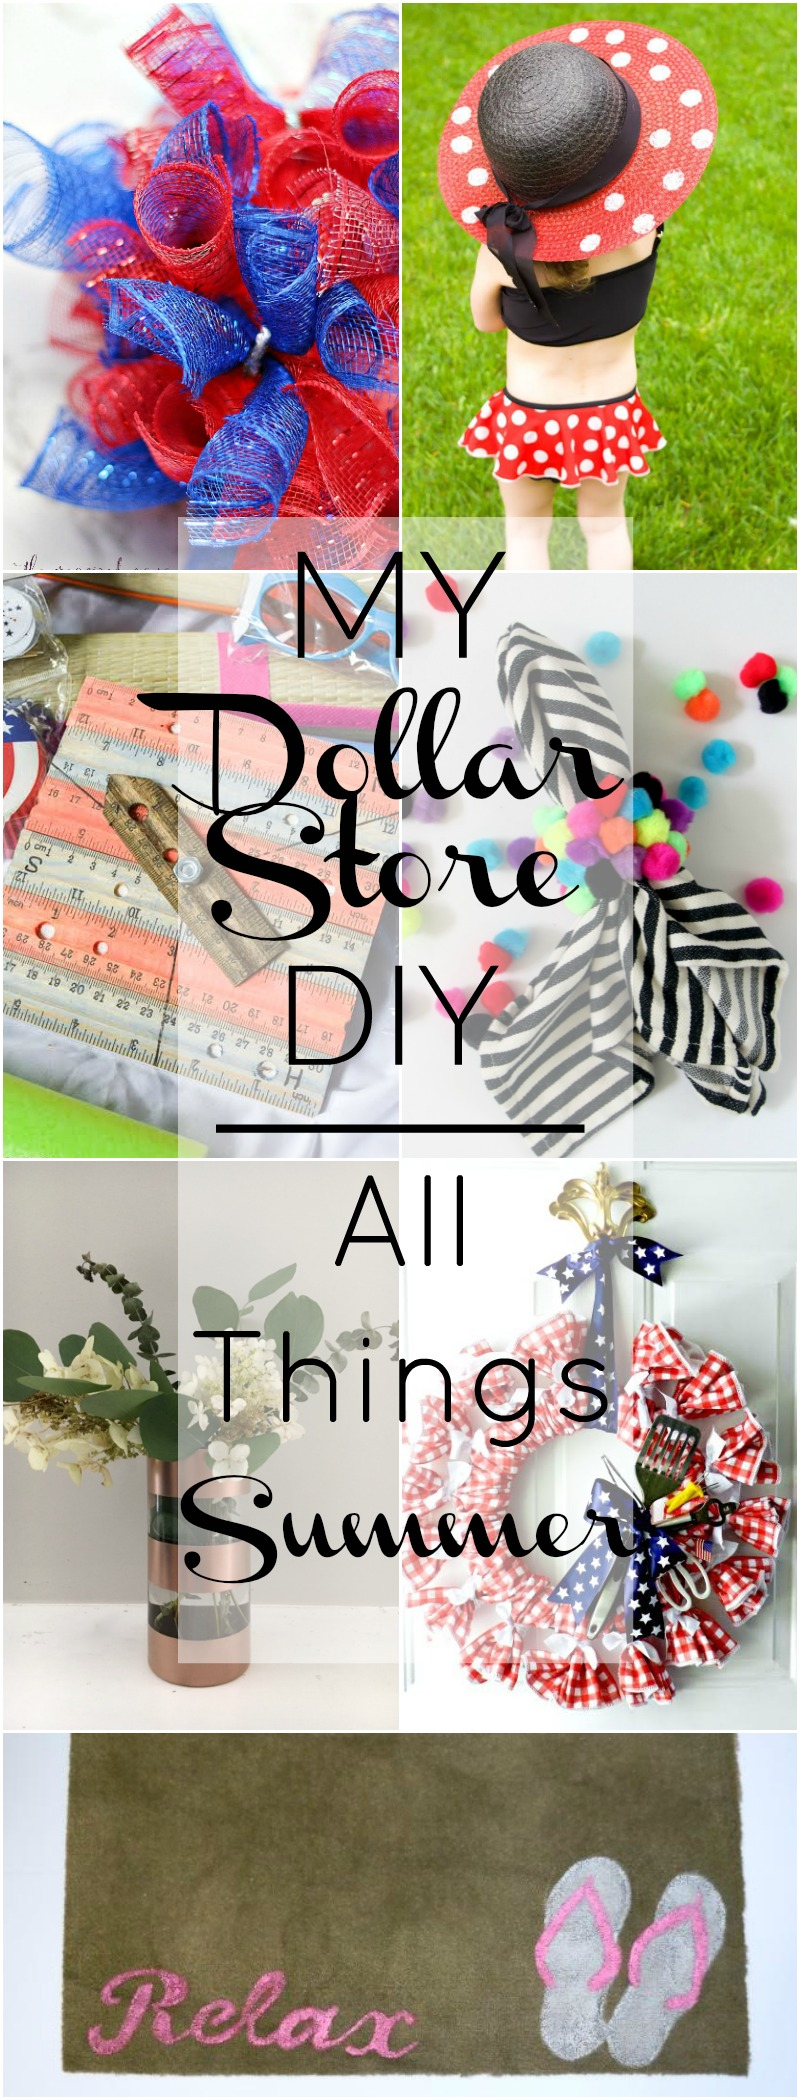 My Dollar Store DIY | All Things Summer!